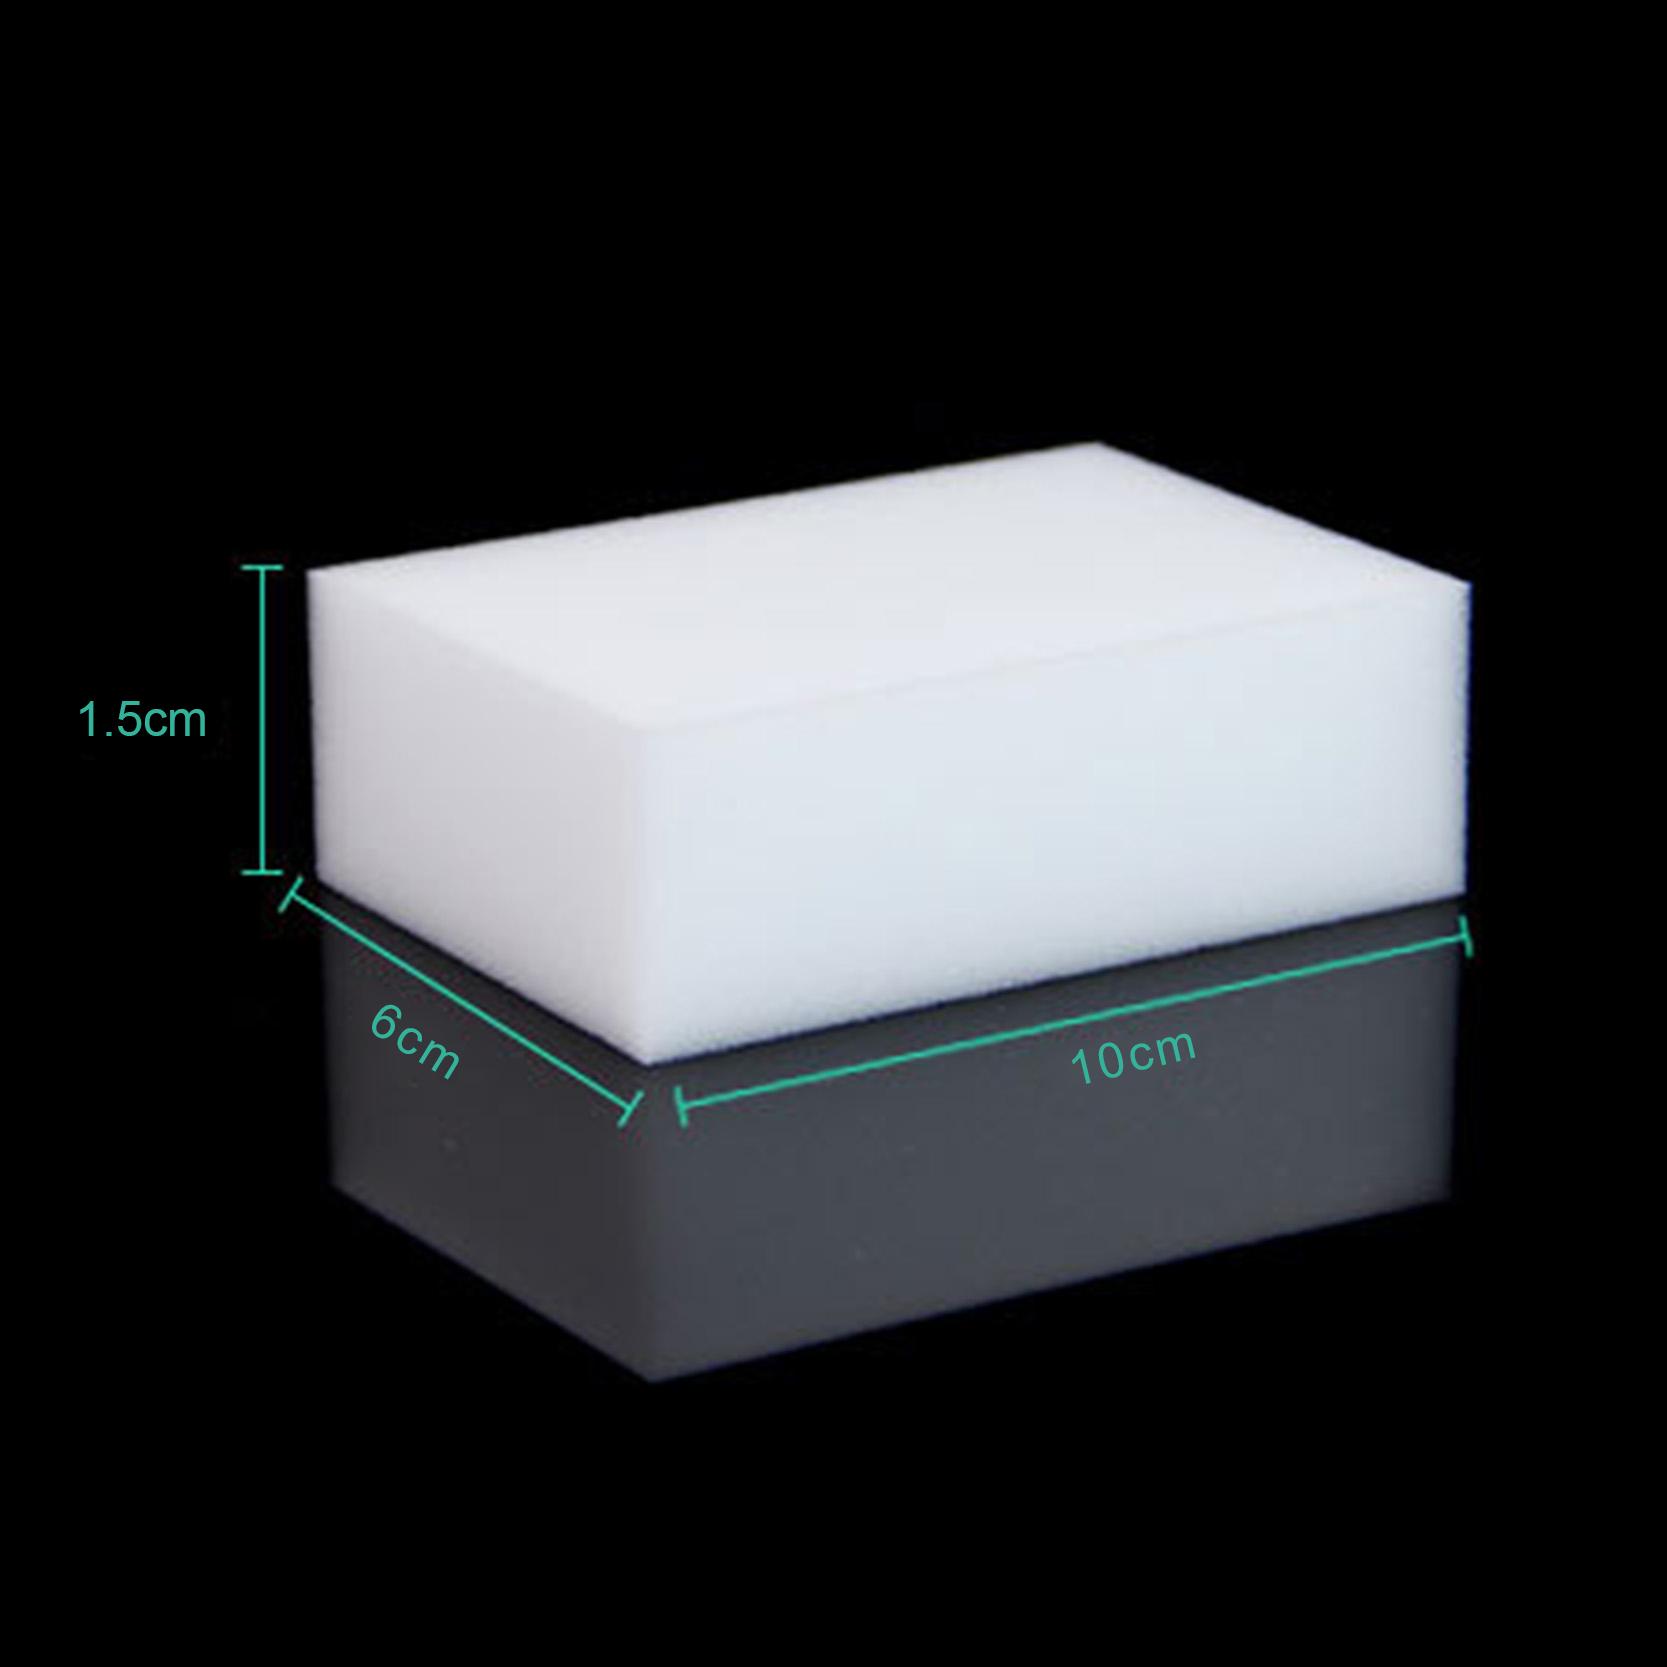 10PCS White Magic Sponge Eraser Melamine Cleaner Multi-Functional Cleaning Nano Sponge Dish New Arrival(China (Mainland))